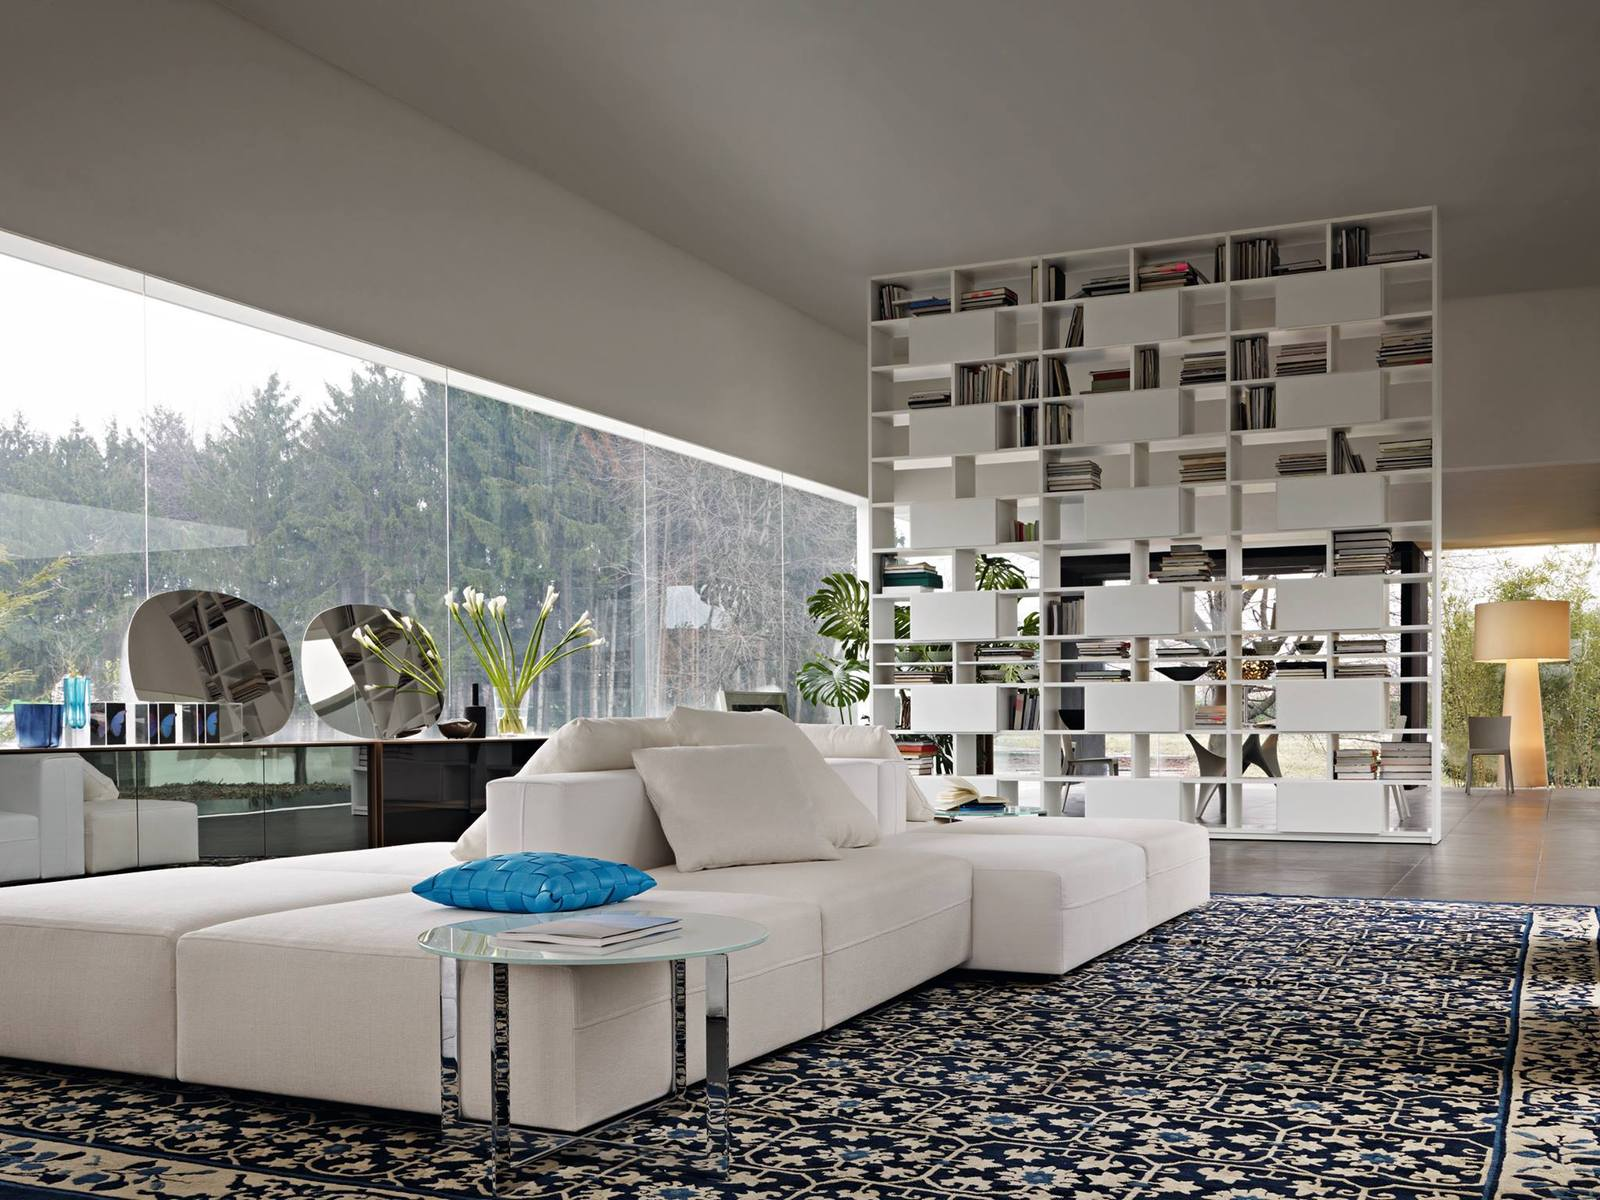 Superbe Home Interior Inspirations From Molteni